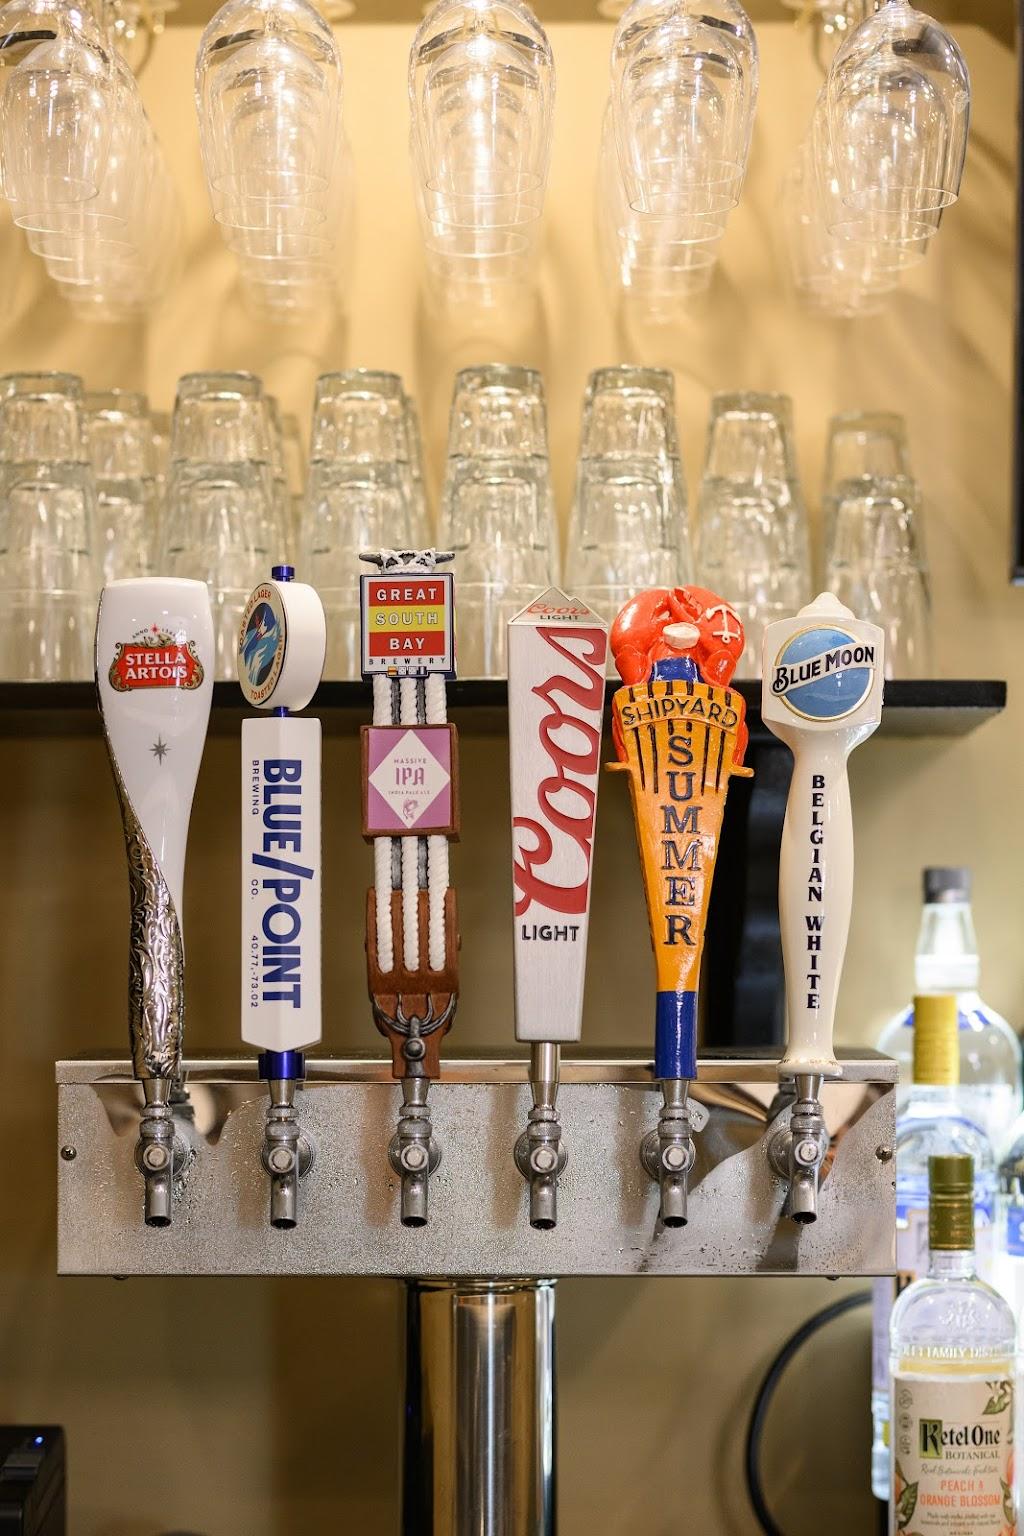 Monroes Restaurant | restaurant | 199 Post Ave, Westbury, NY 11590, USA | 5164164181 OR +1 516-416-4181